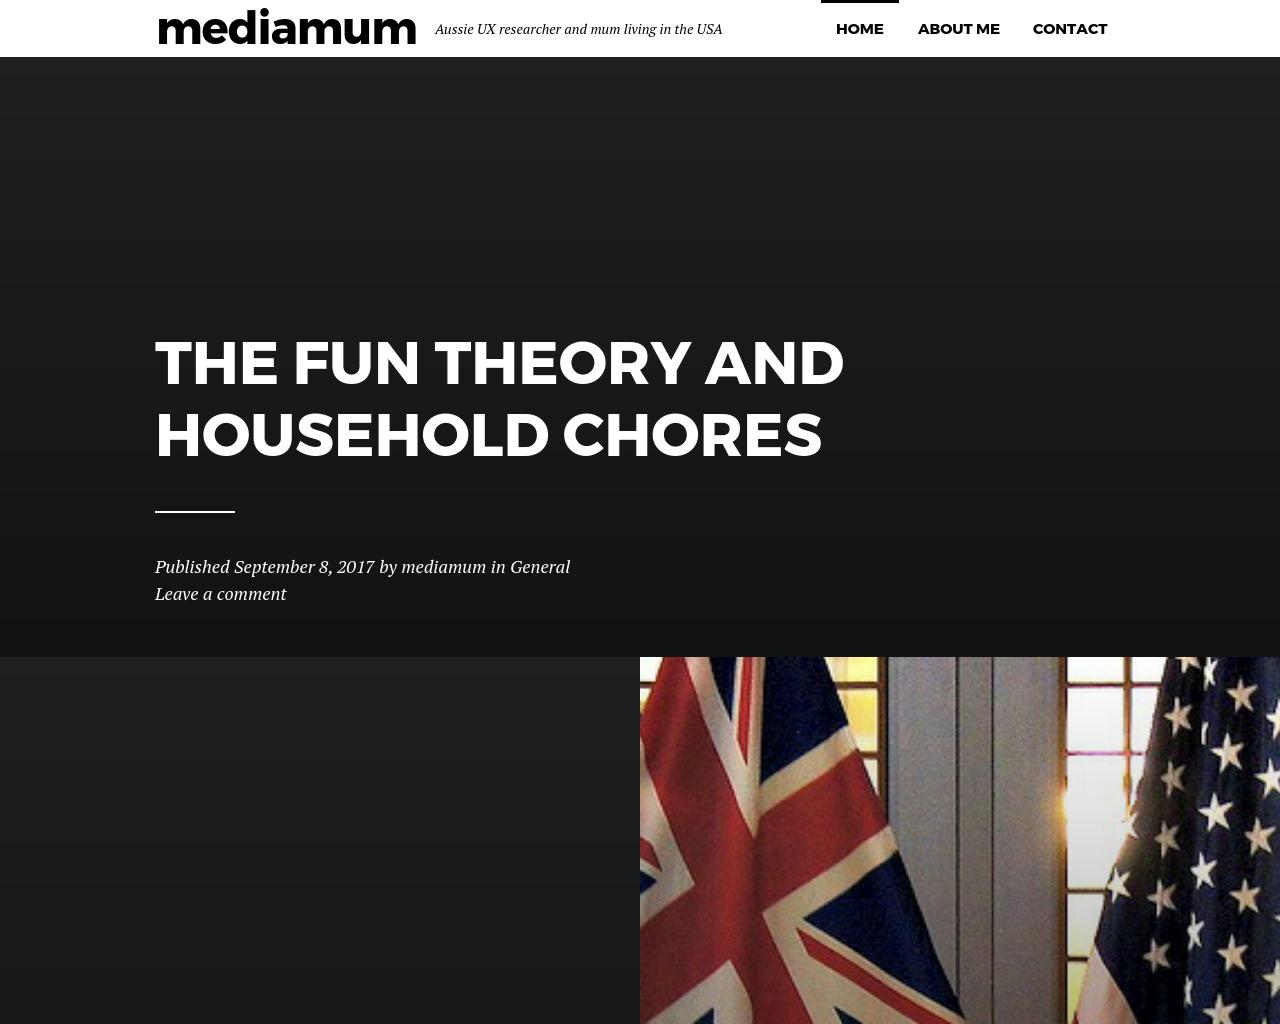 MediaMum-Advertising-Reviews-Pricing